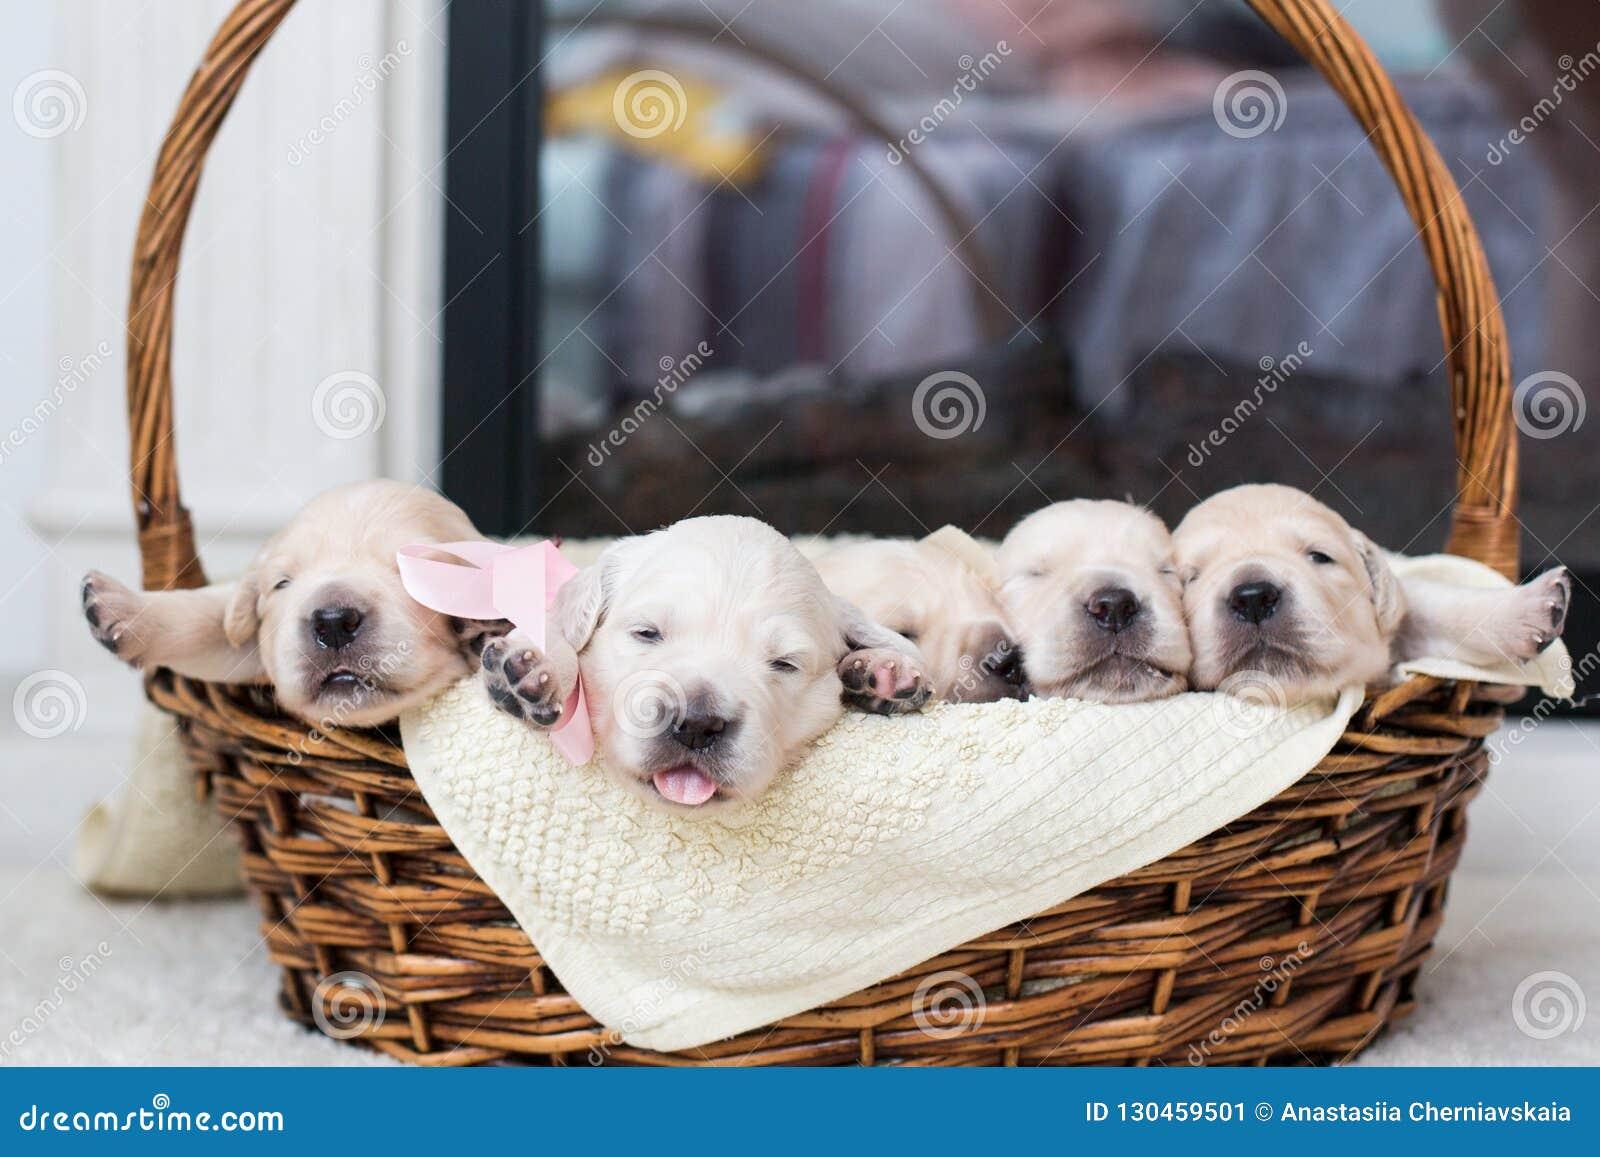 Five Adorable Golden Retriever puppies in a wicker basket